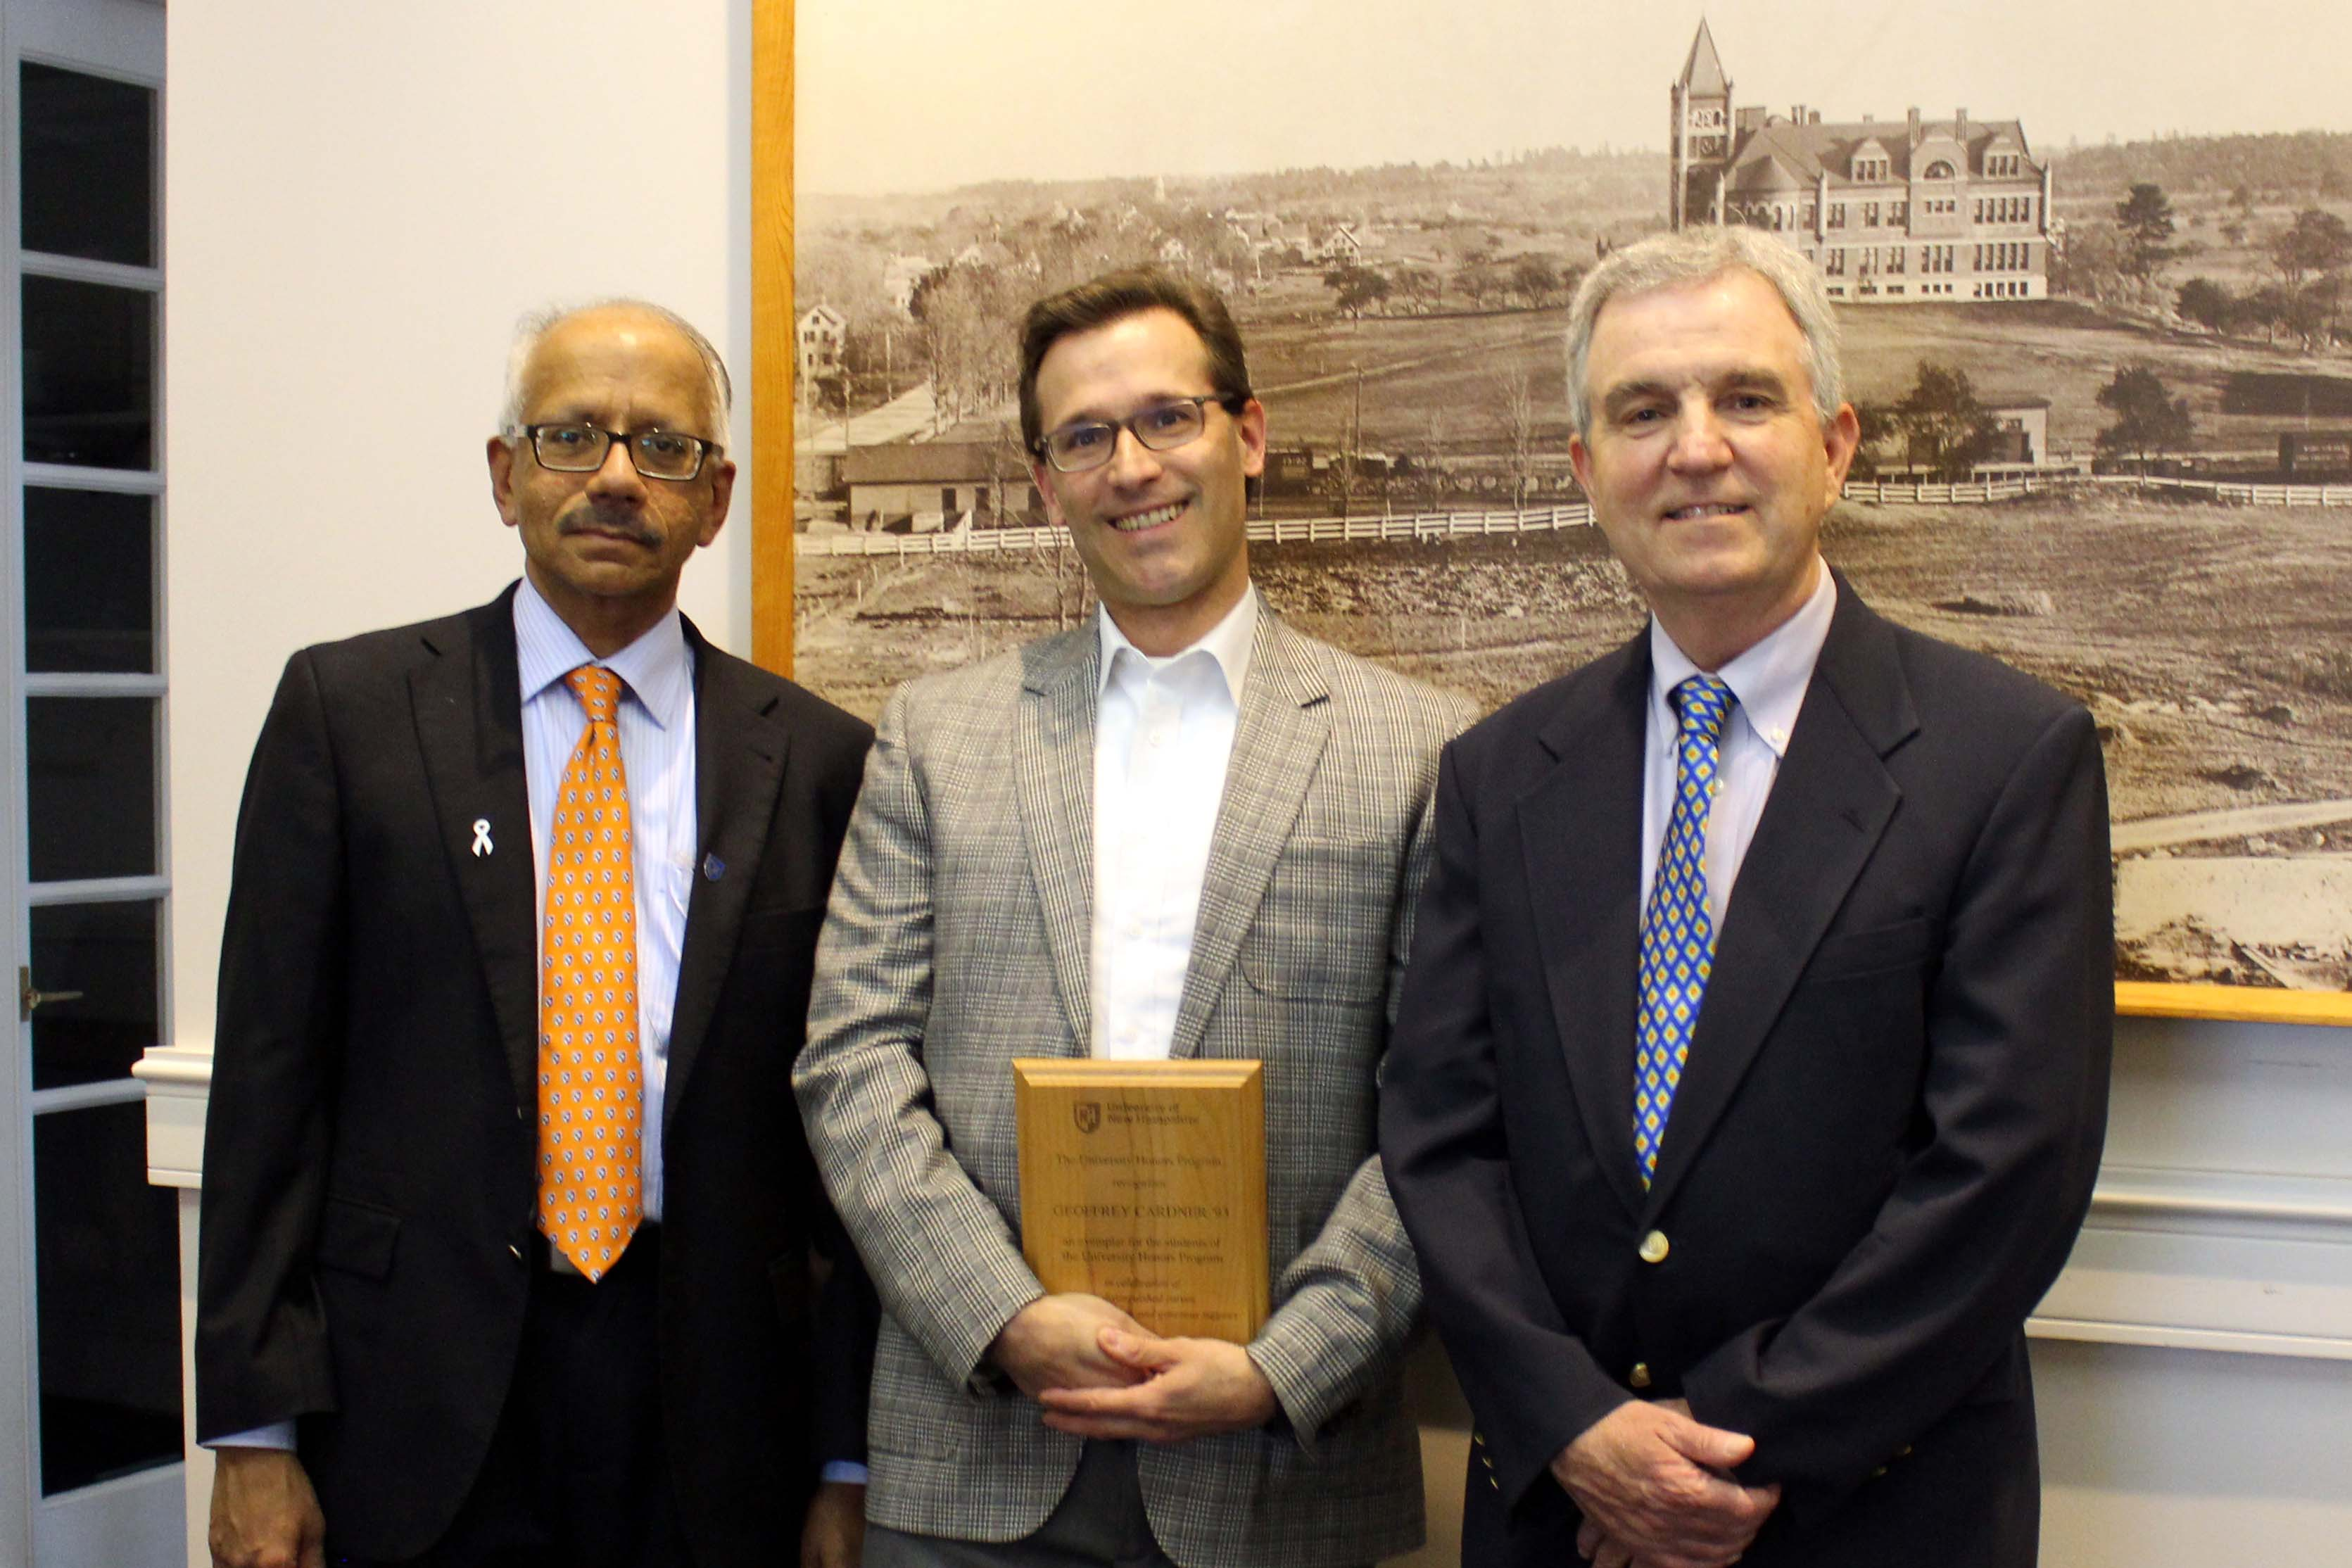 P.T. Vasudevan, Geoffrey Cardner, and Jerry Marx